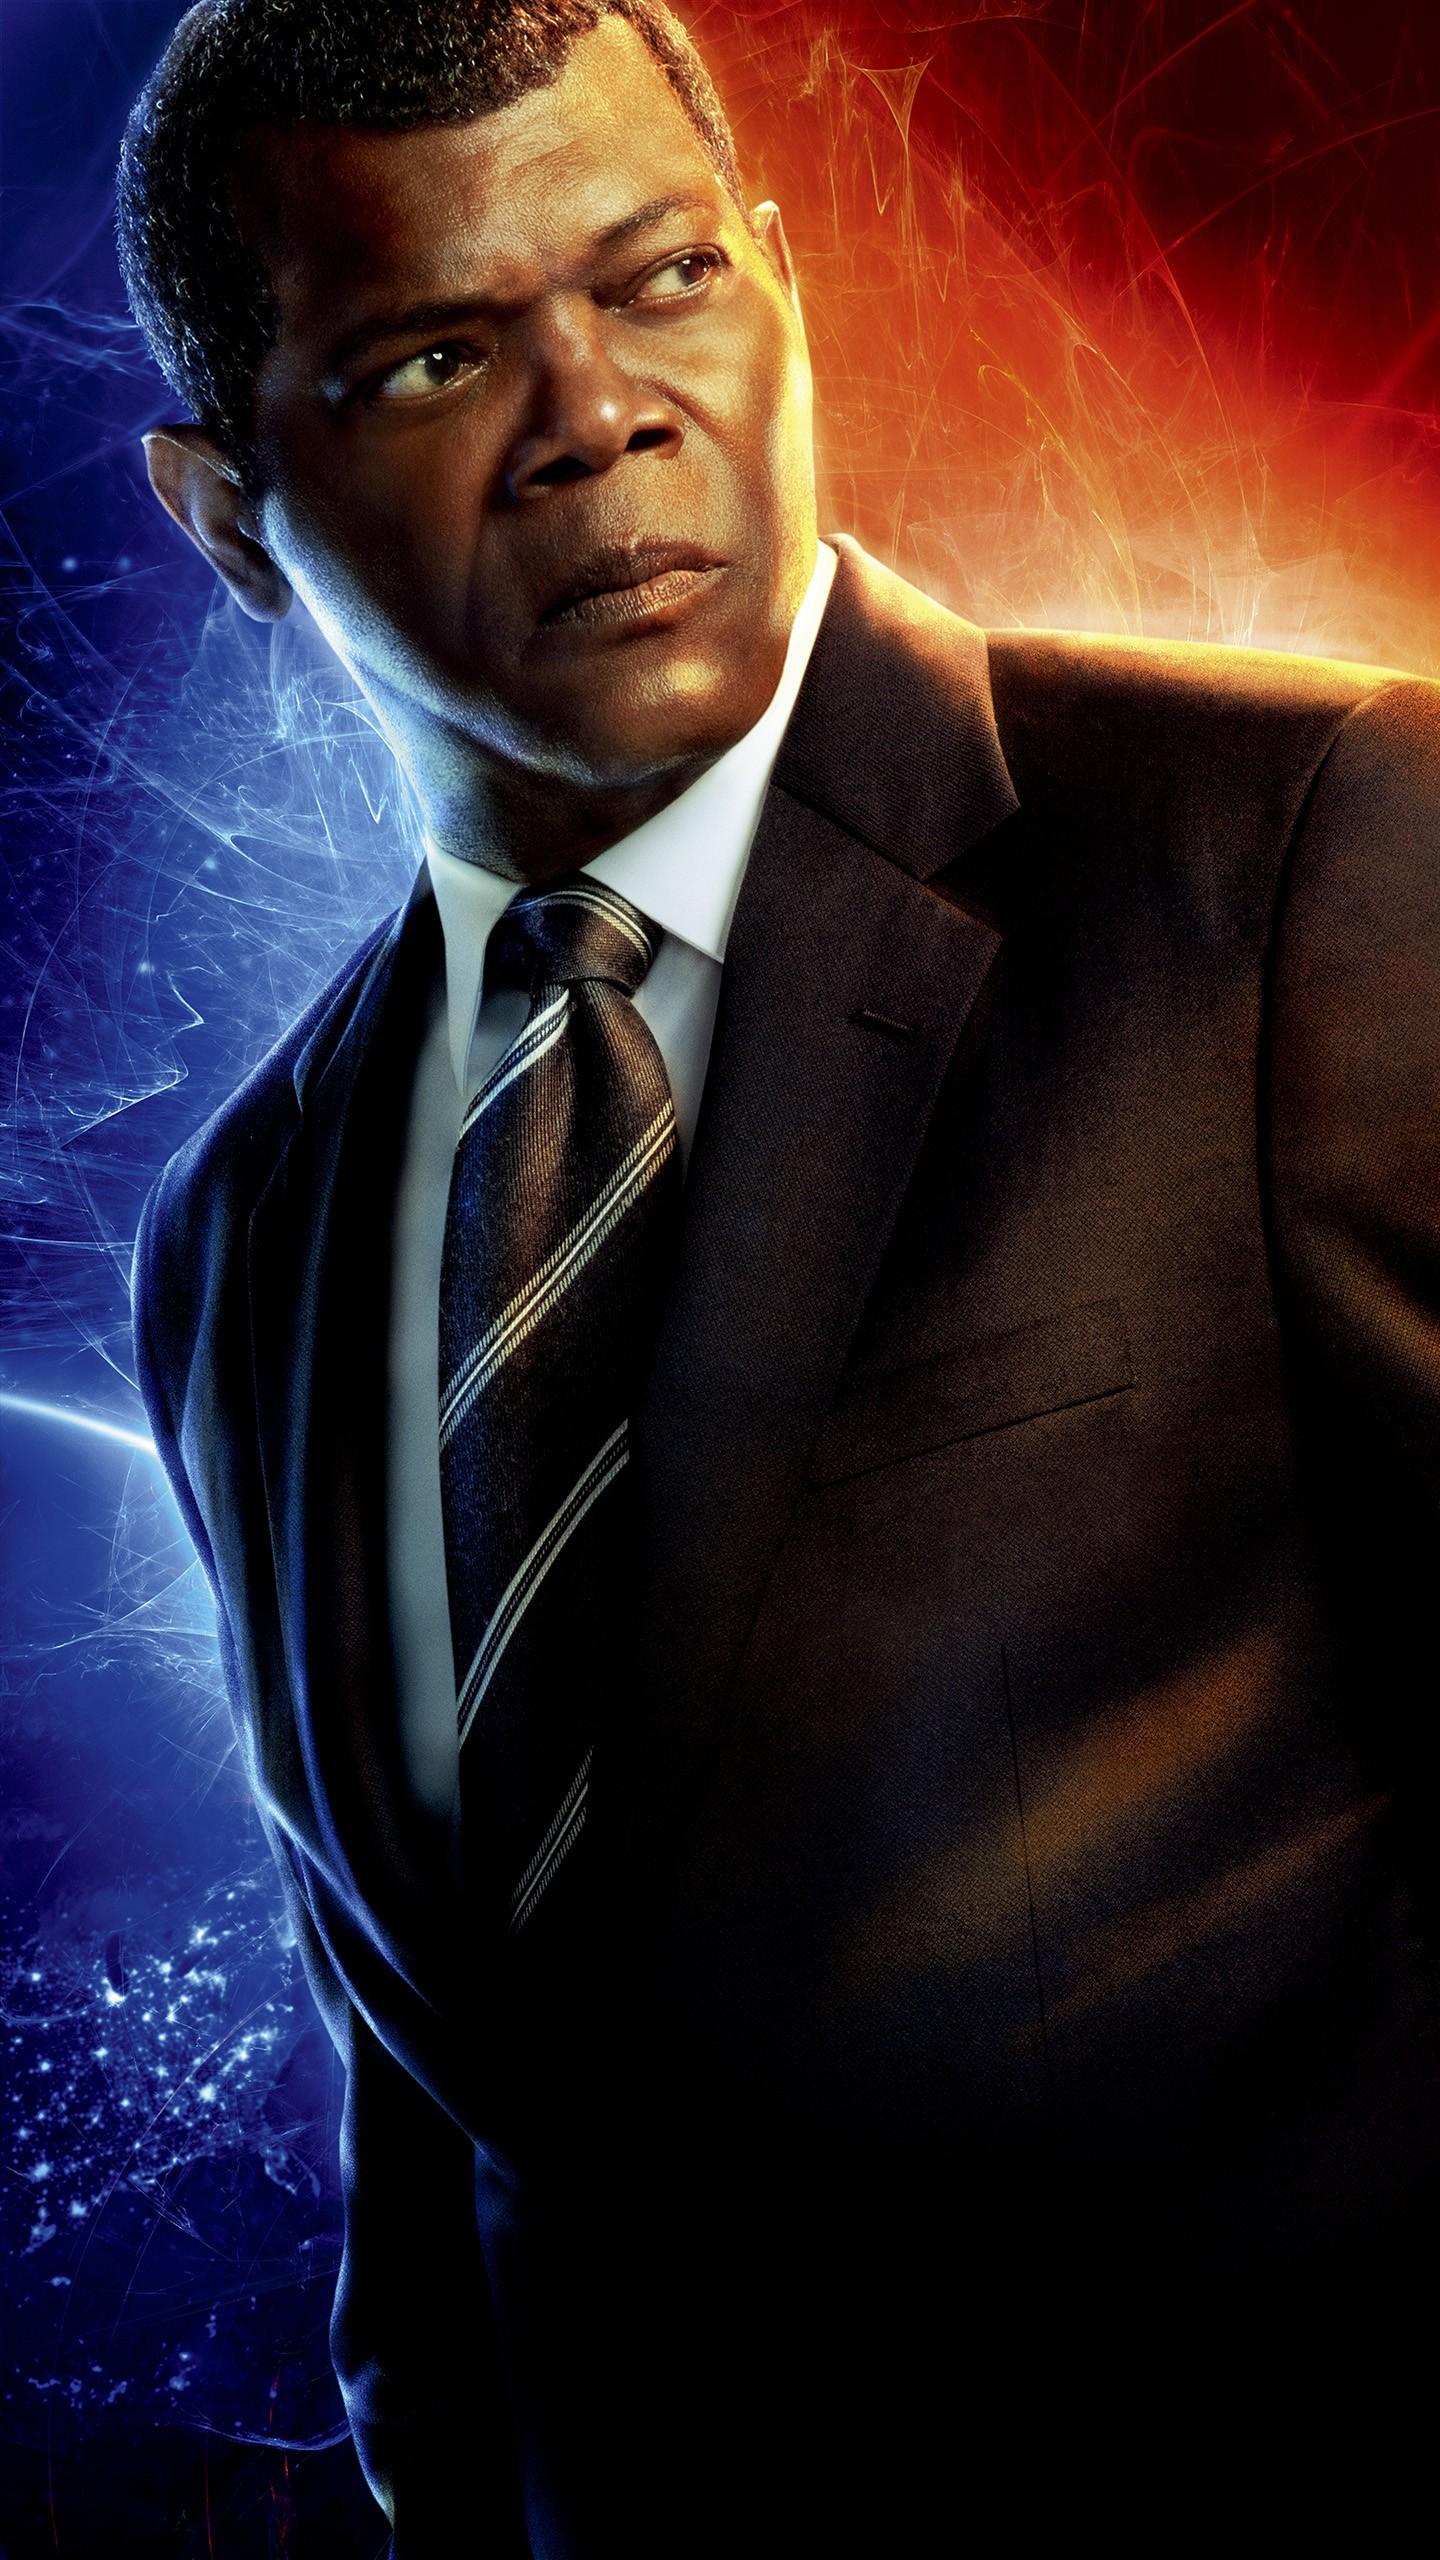 Iphone 6s Video Wallpaper Samuel Jackson As Nick Fury In Captain Marvel 4k 5k